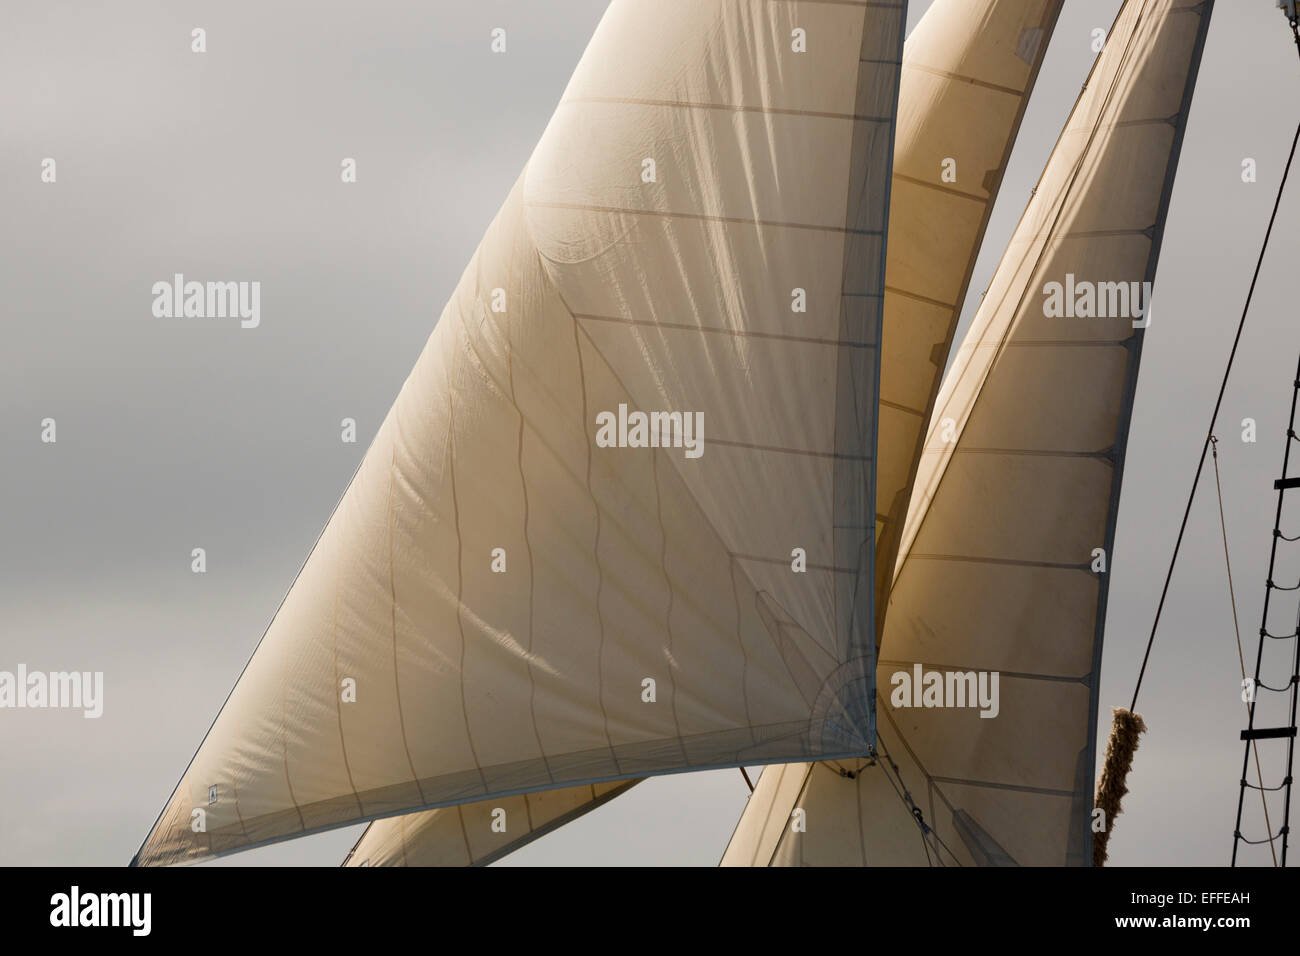 Sails and Rigging Tall Ship Falmouth; UK - Stock Image